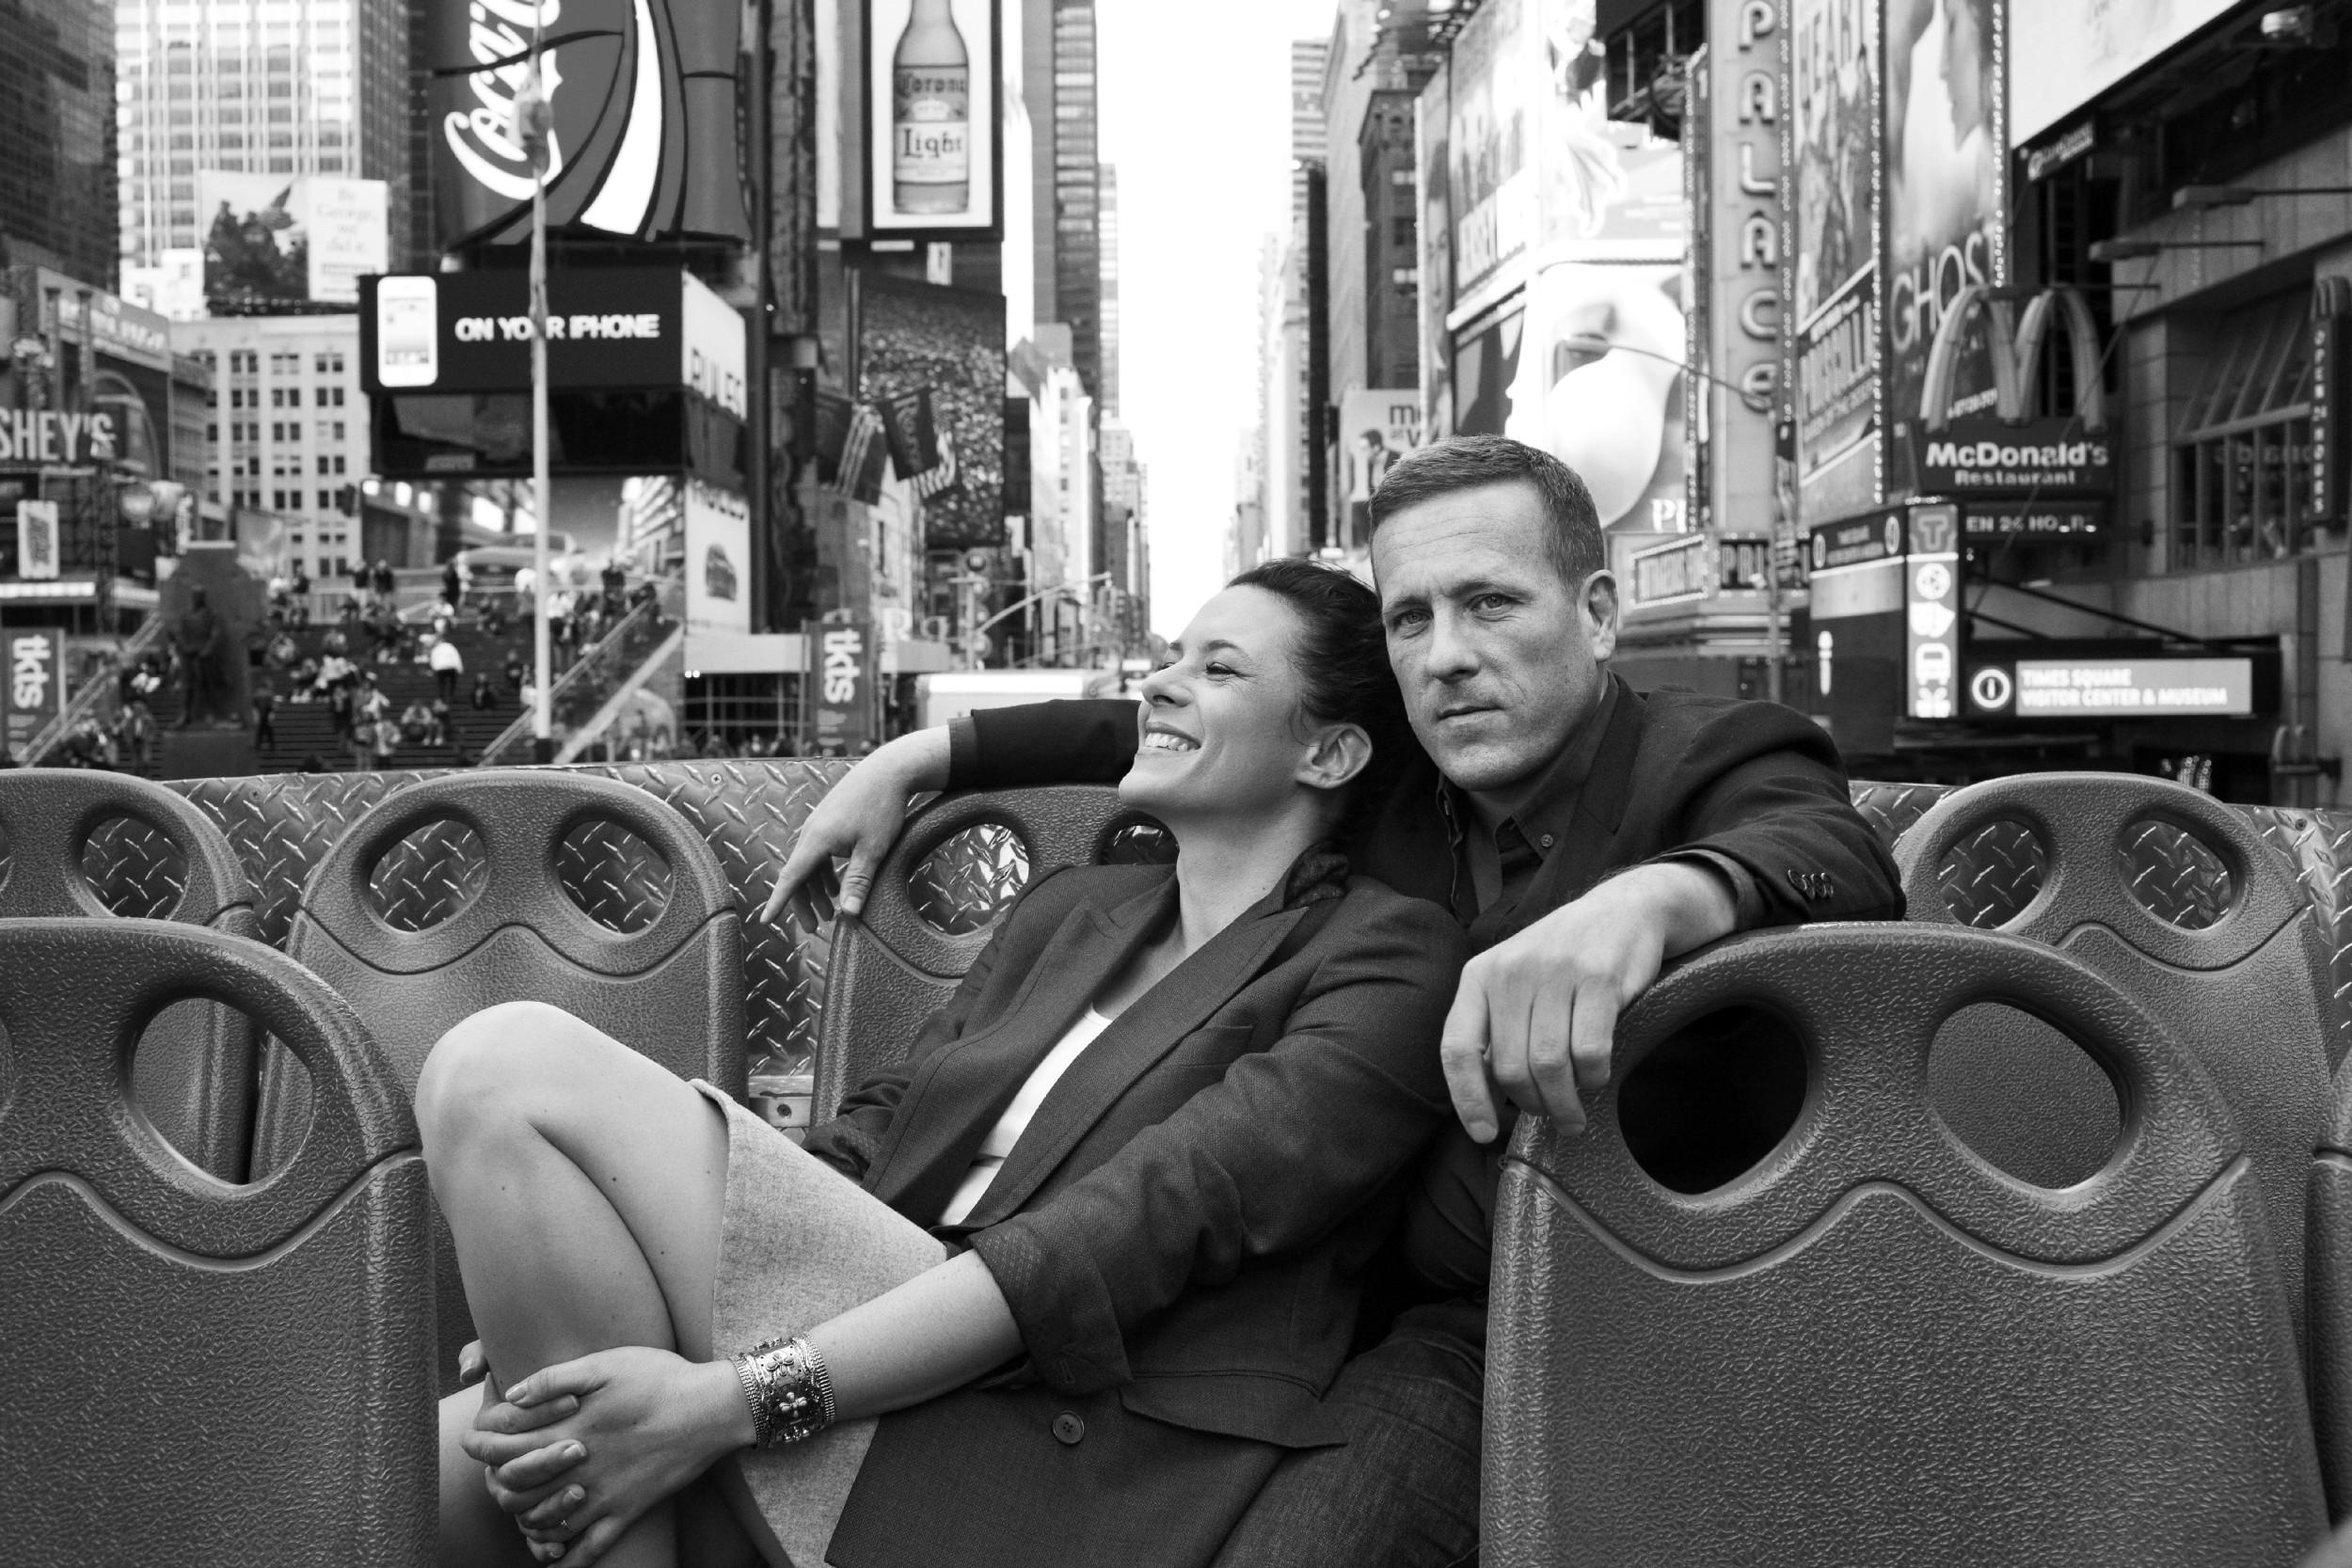 Garance Doré and Scott Schuman. Photo via Garance Doré.